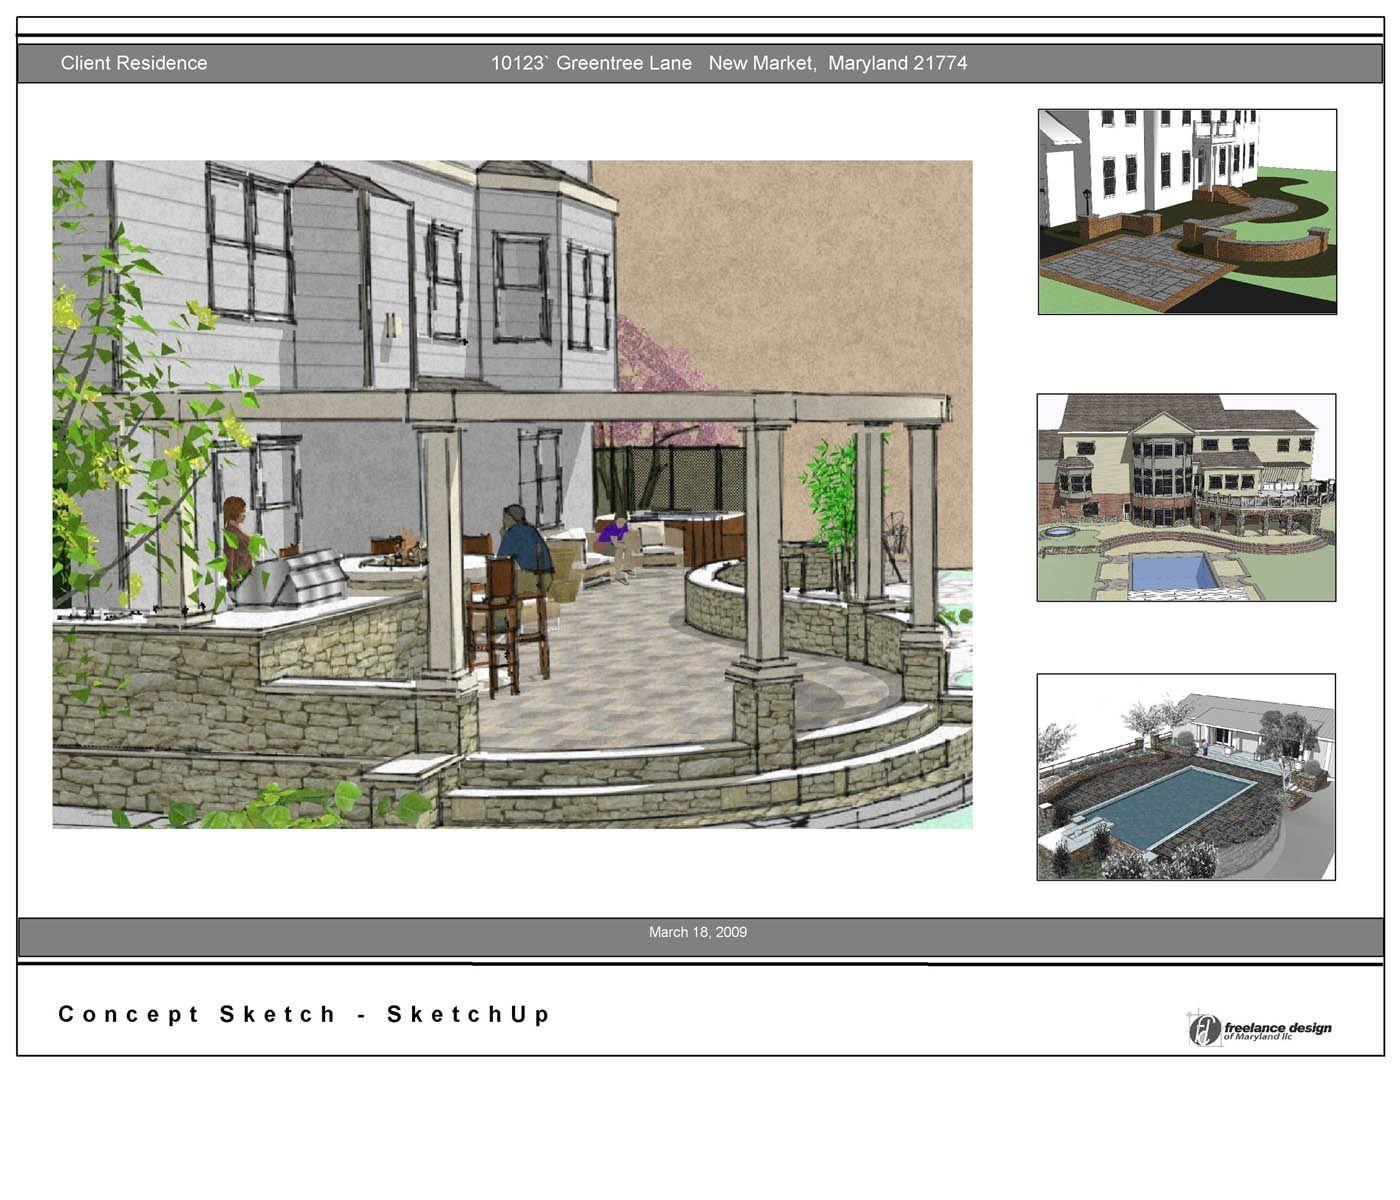 patio | Freelance Design of Maryland | House styles ...